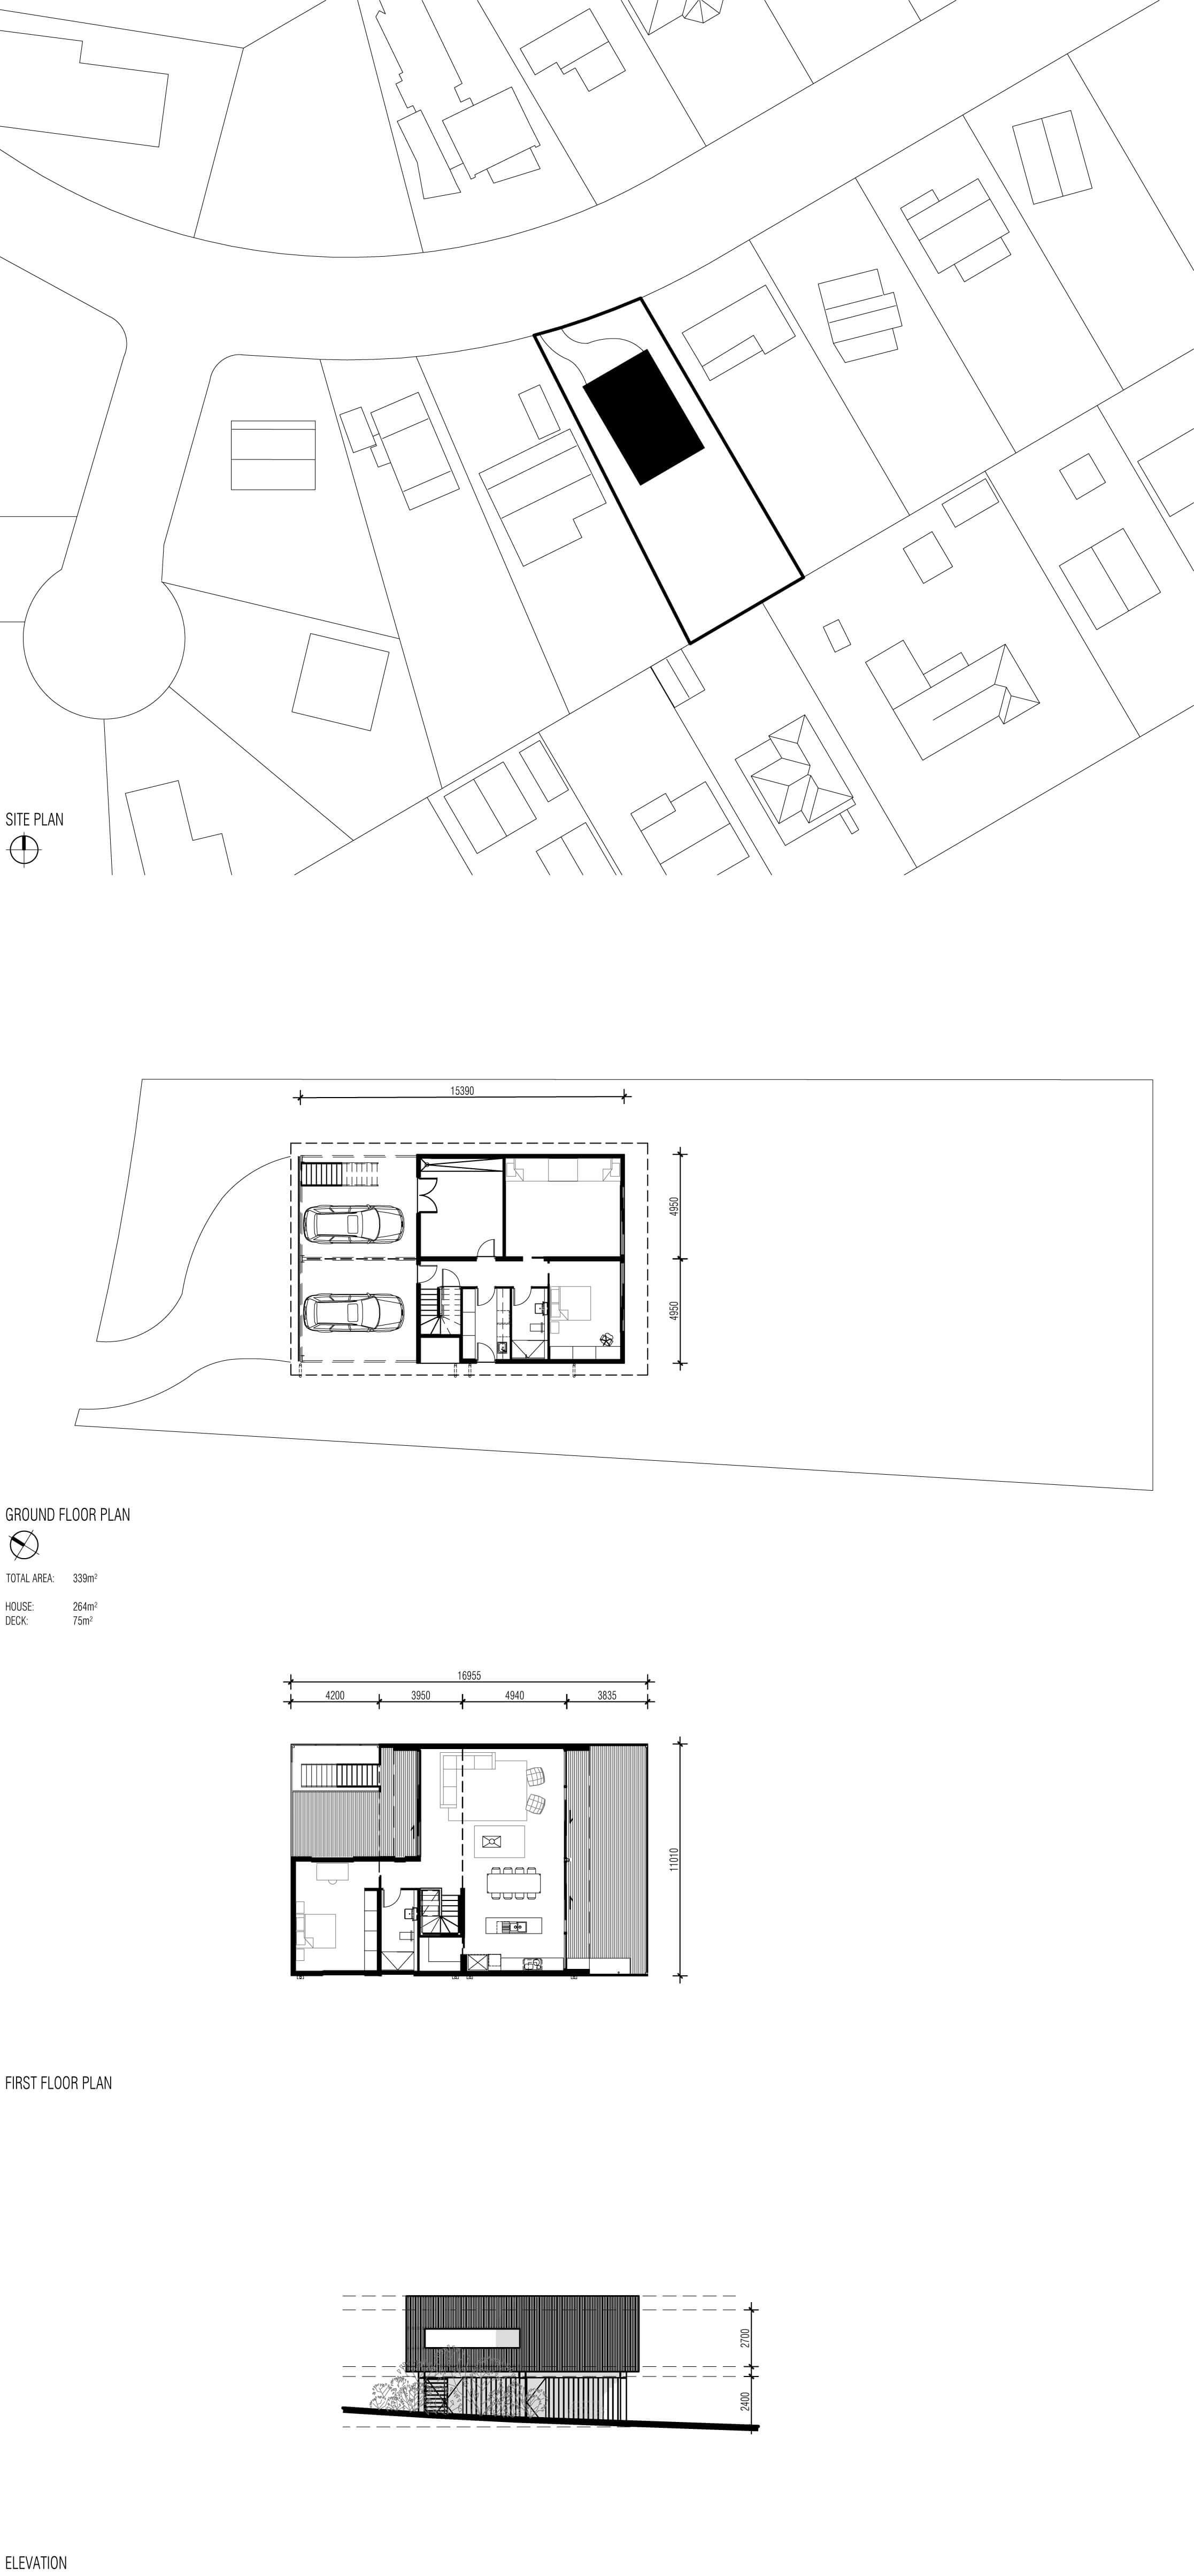 Modular home in Shoreham, VIC